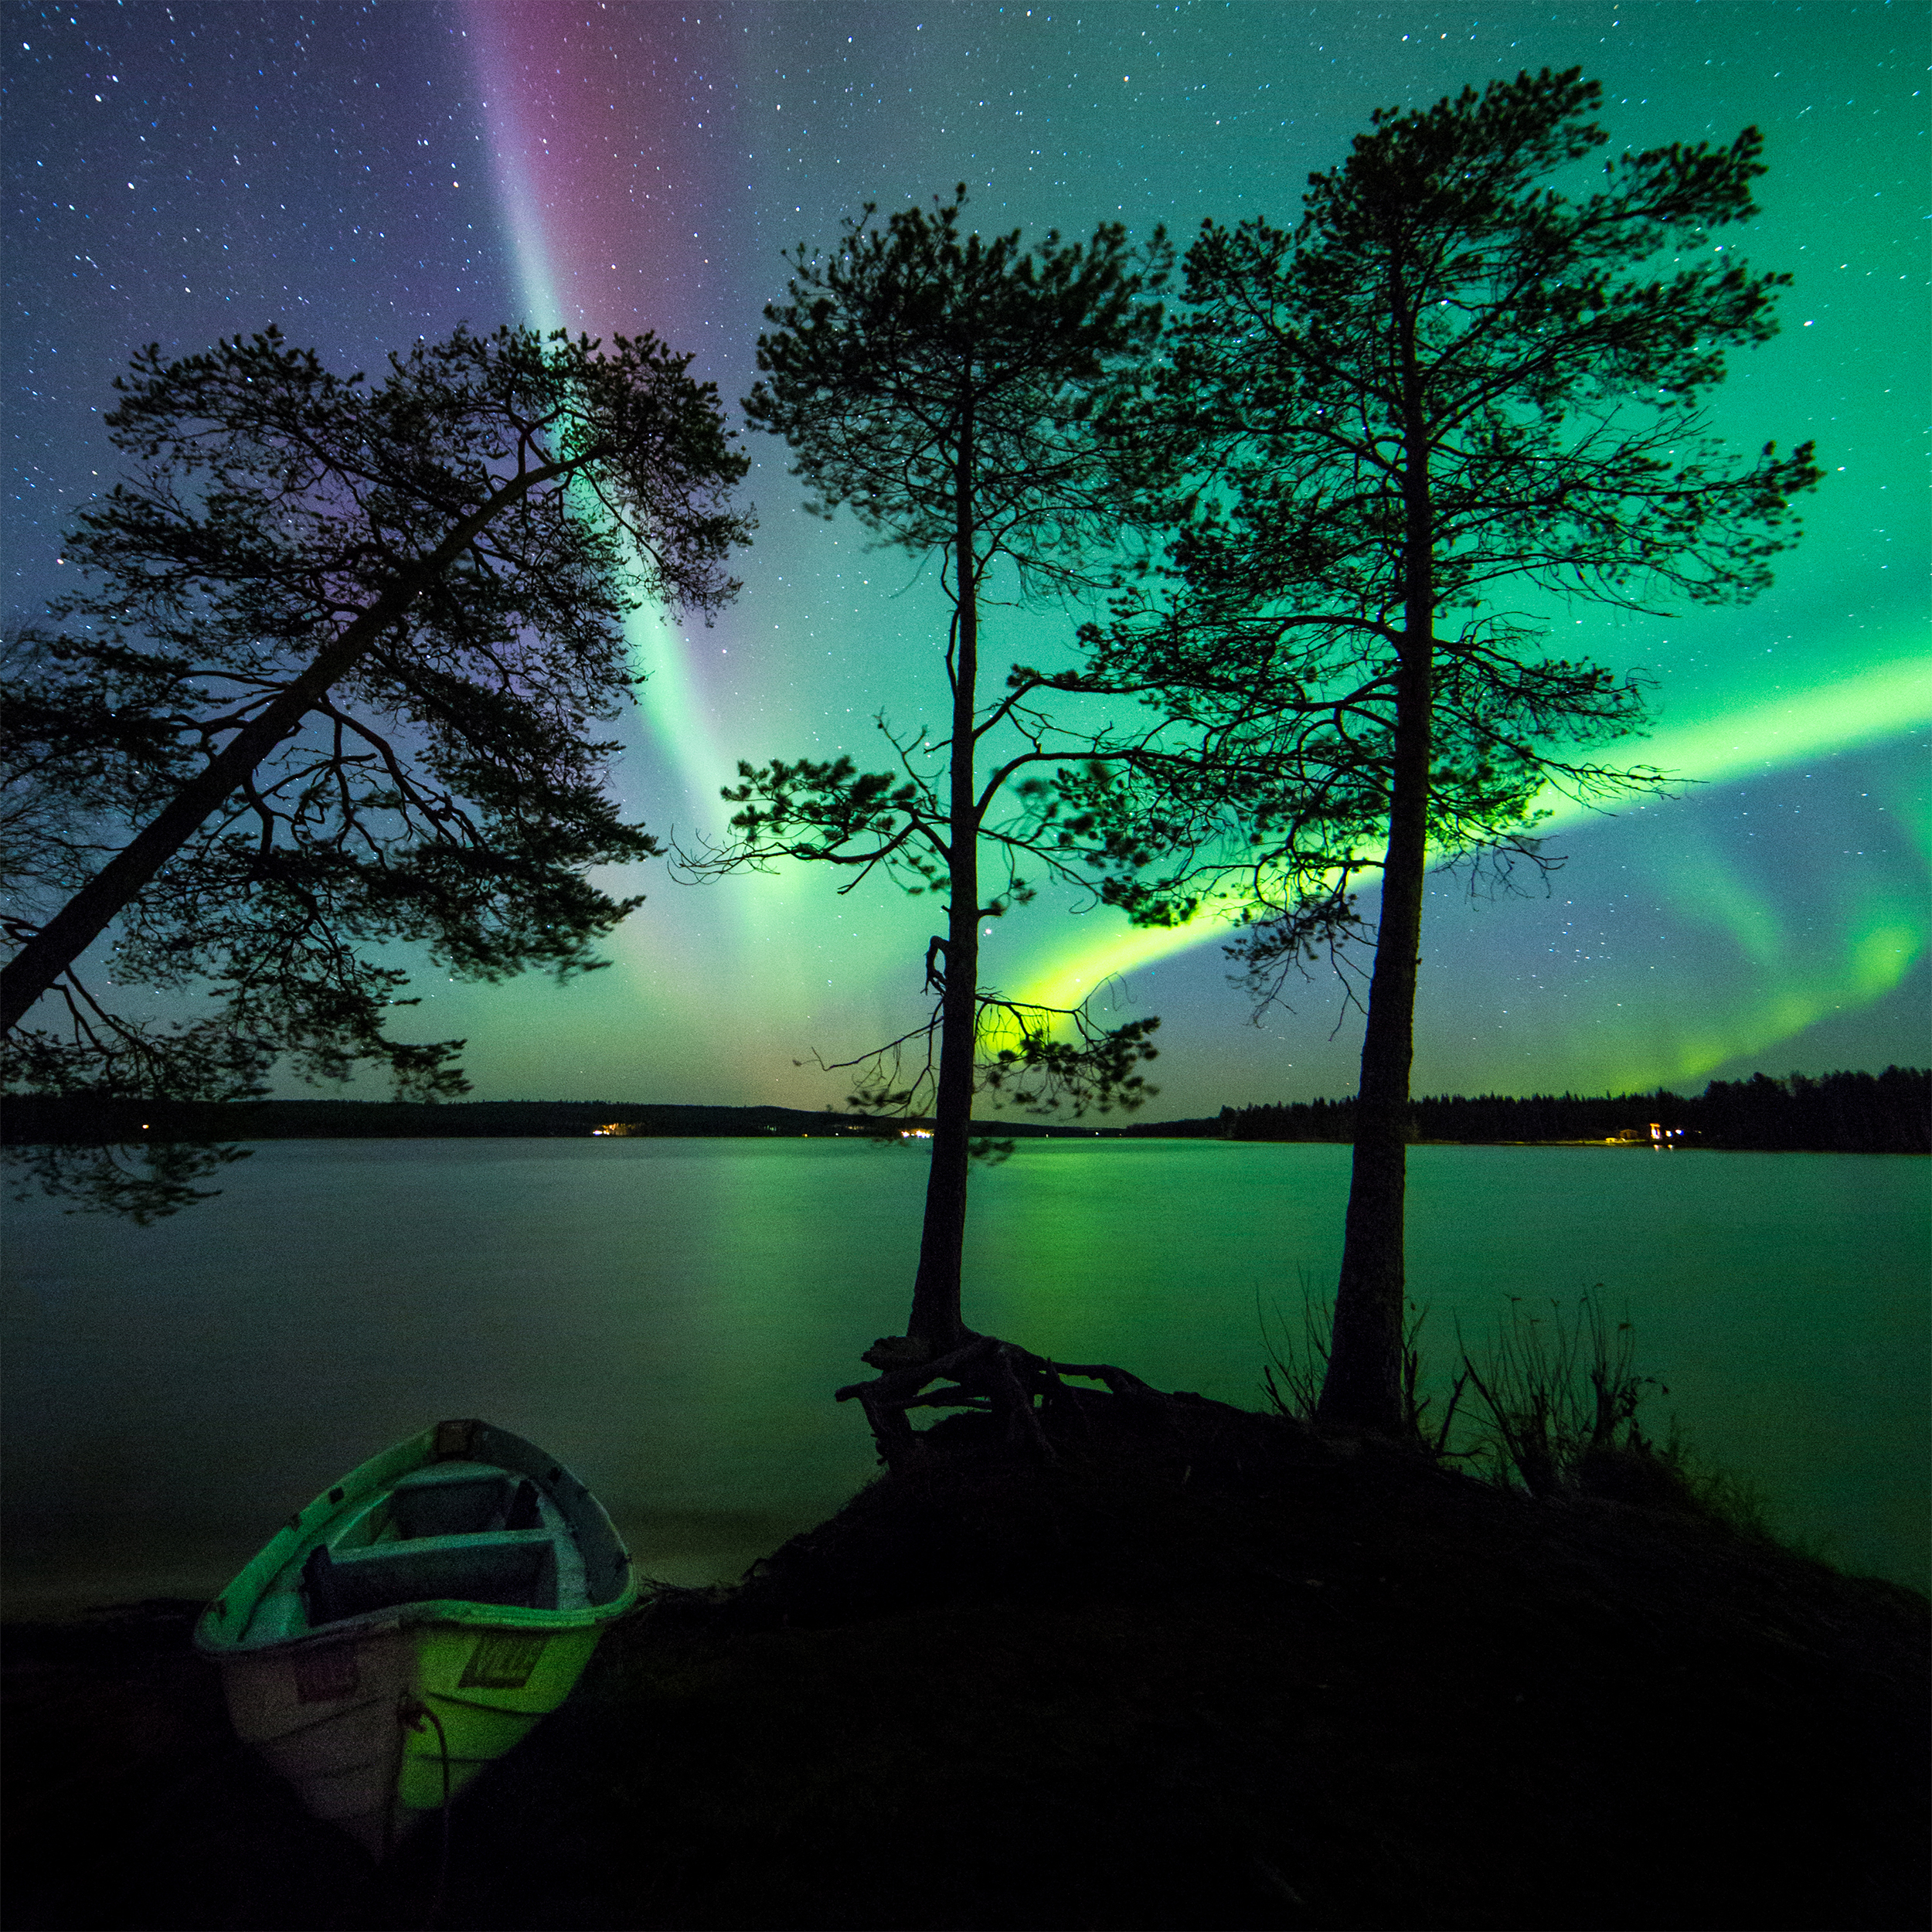 One night in Lapland